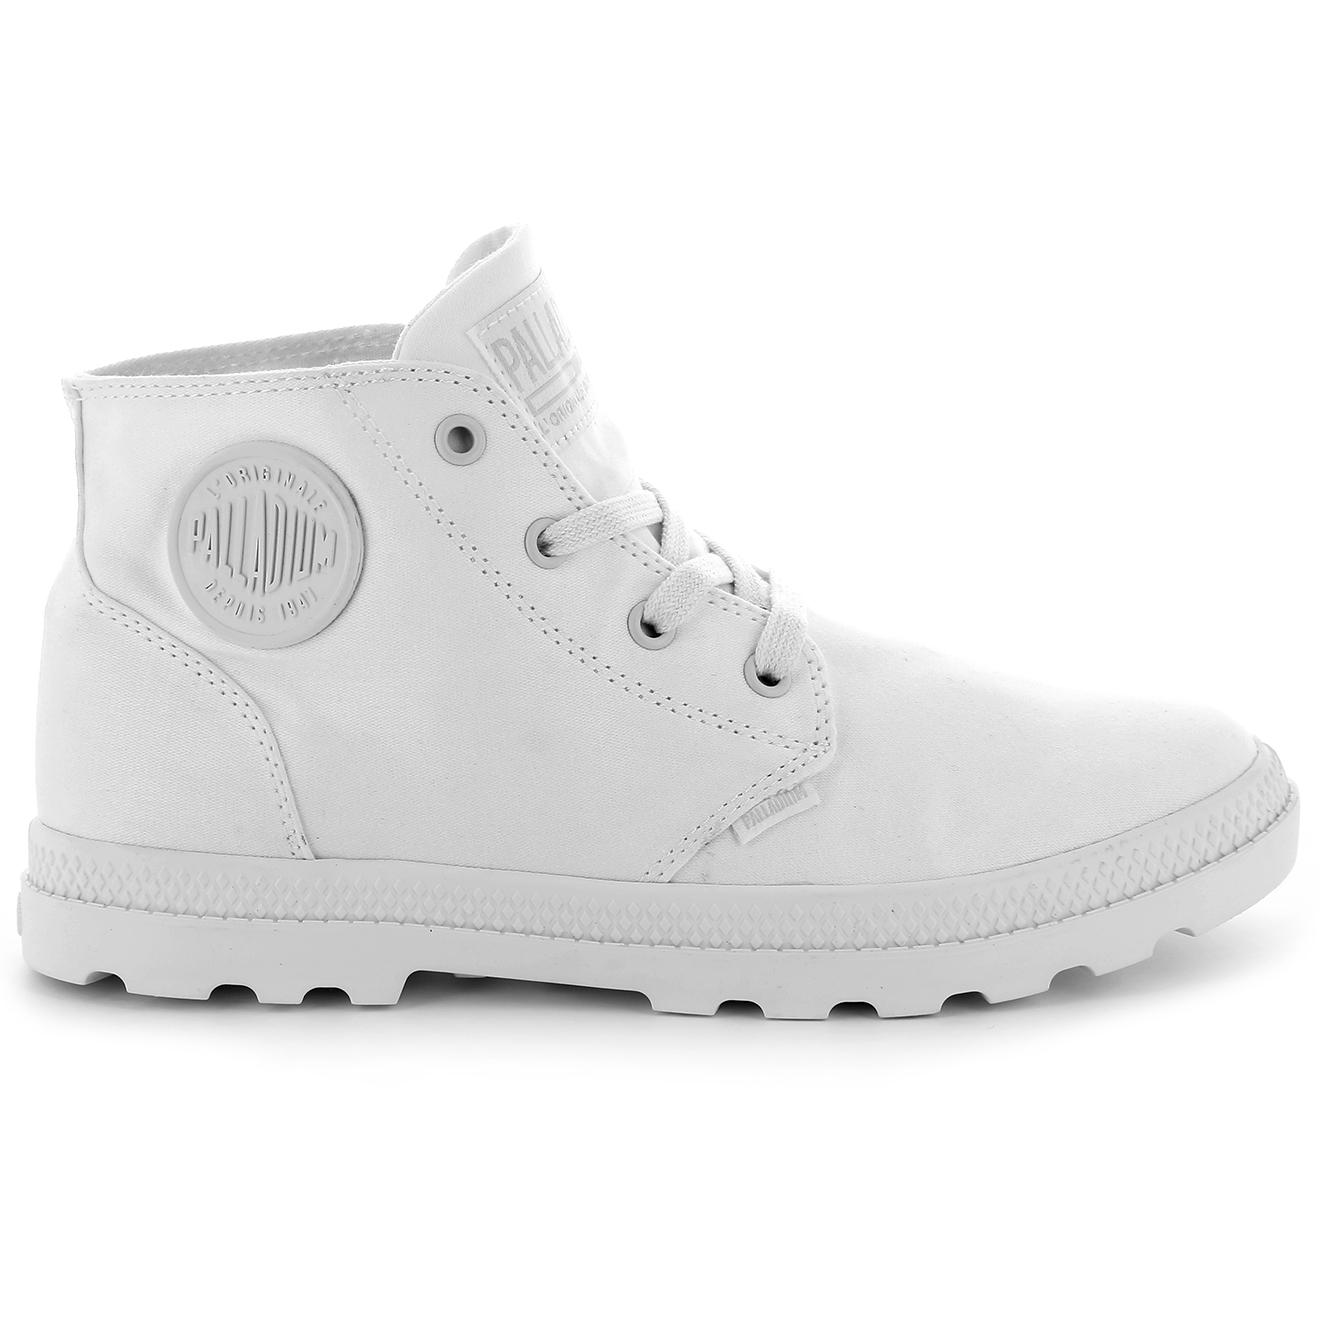 Boots montantes en Toile Pampa Free blanches - Palladium - Modalova